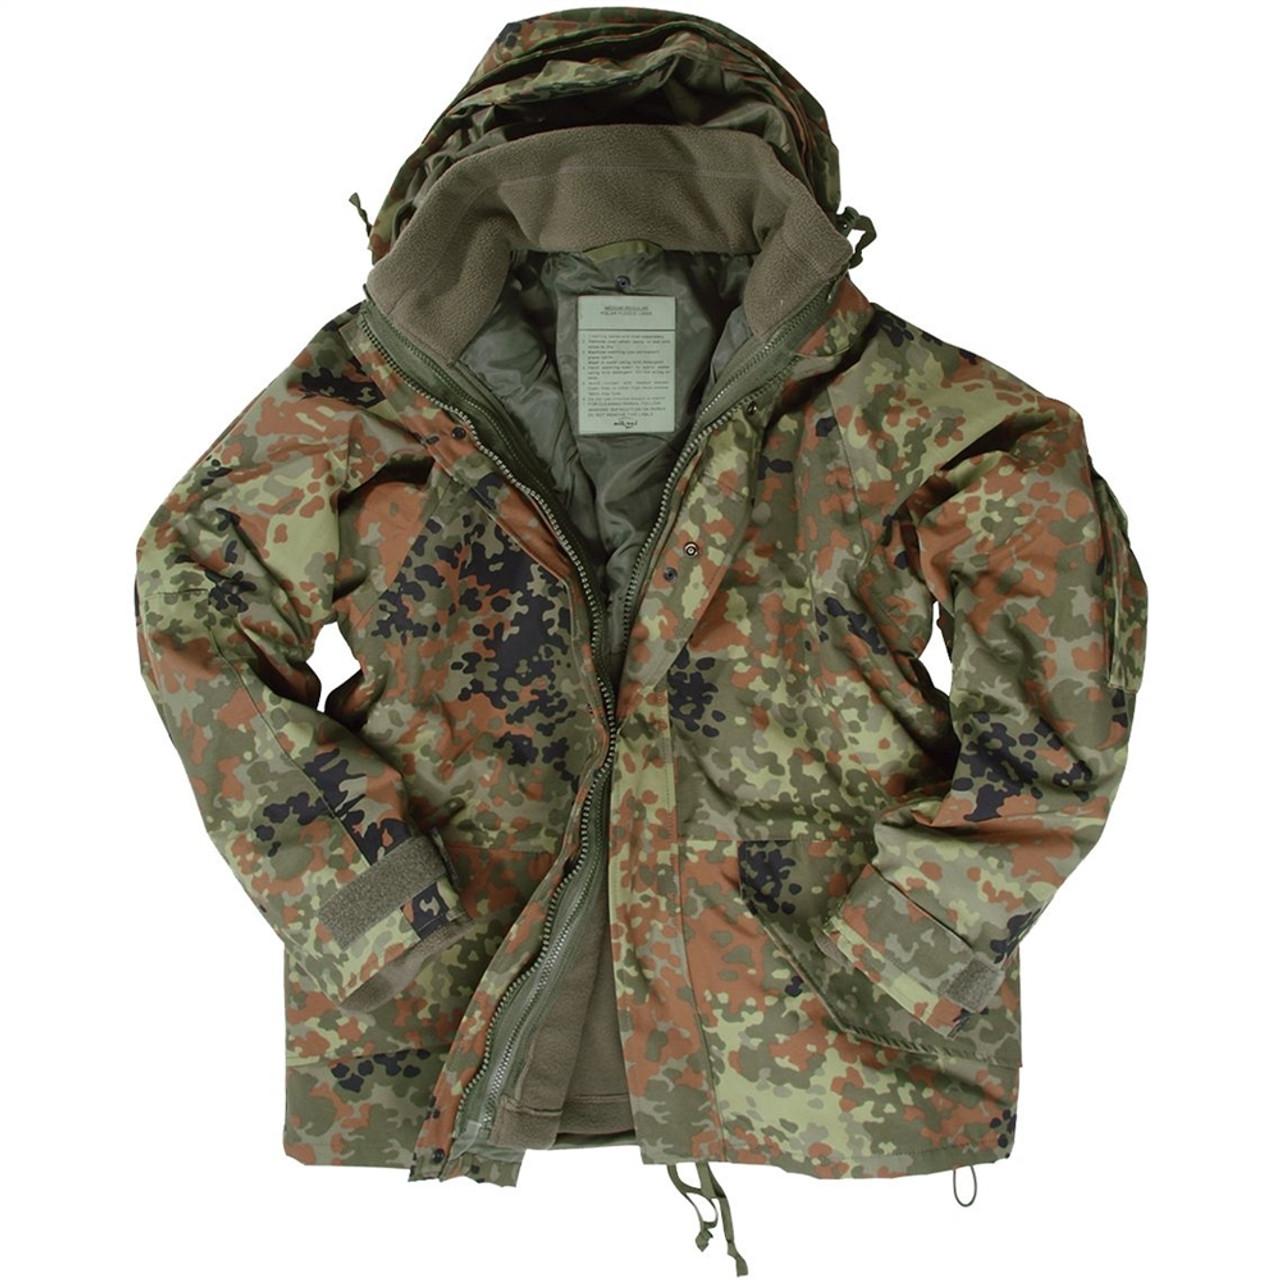 MIL-TEC Bw Flectarn Camo Wet Weather Jacket With Fleece Liner